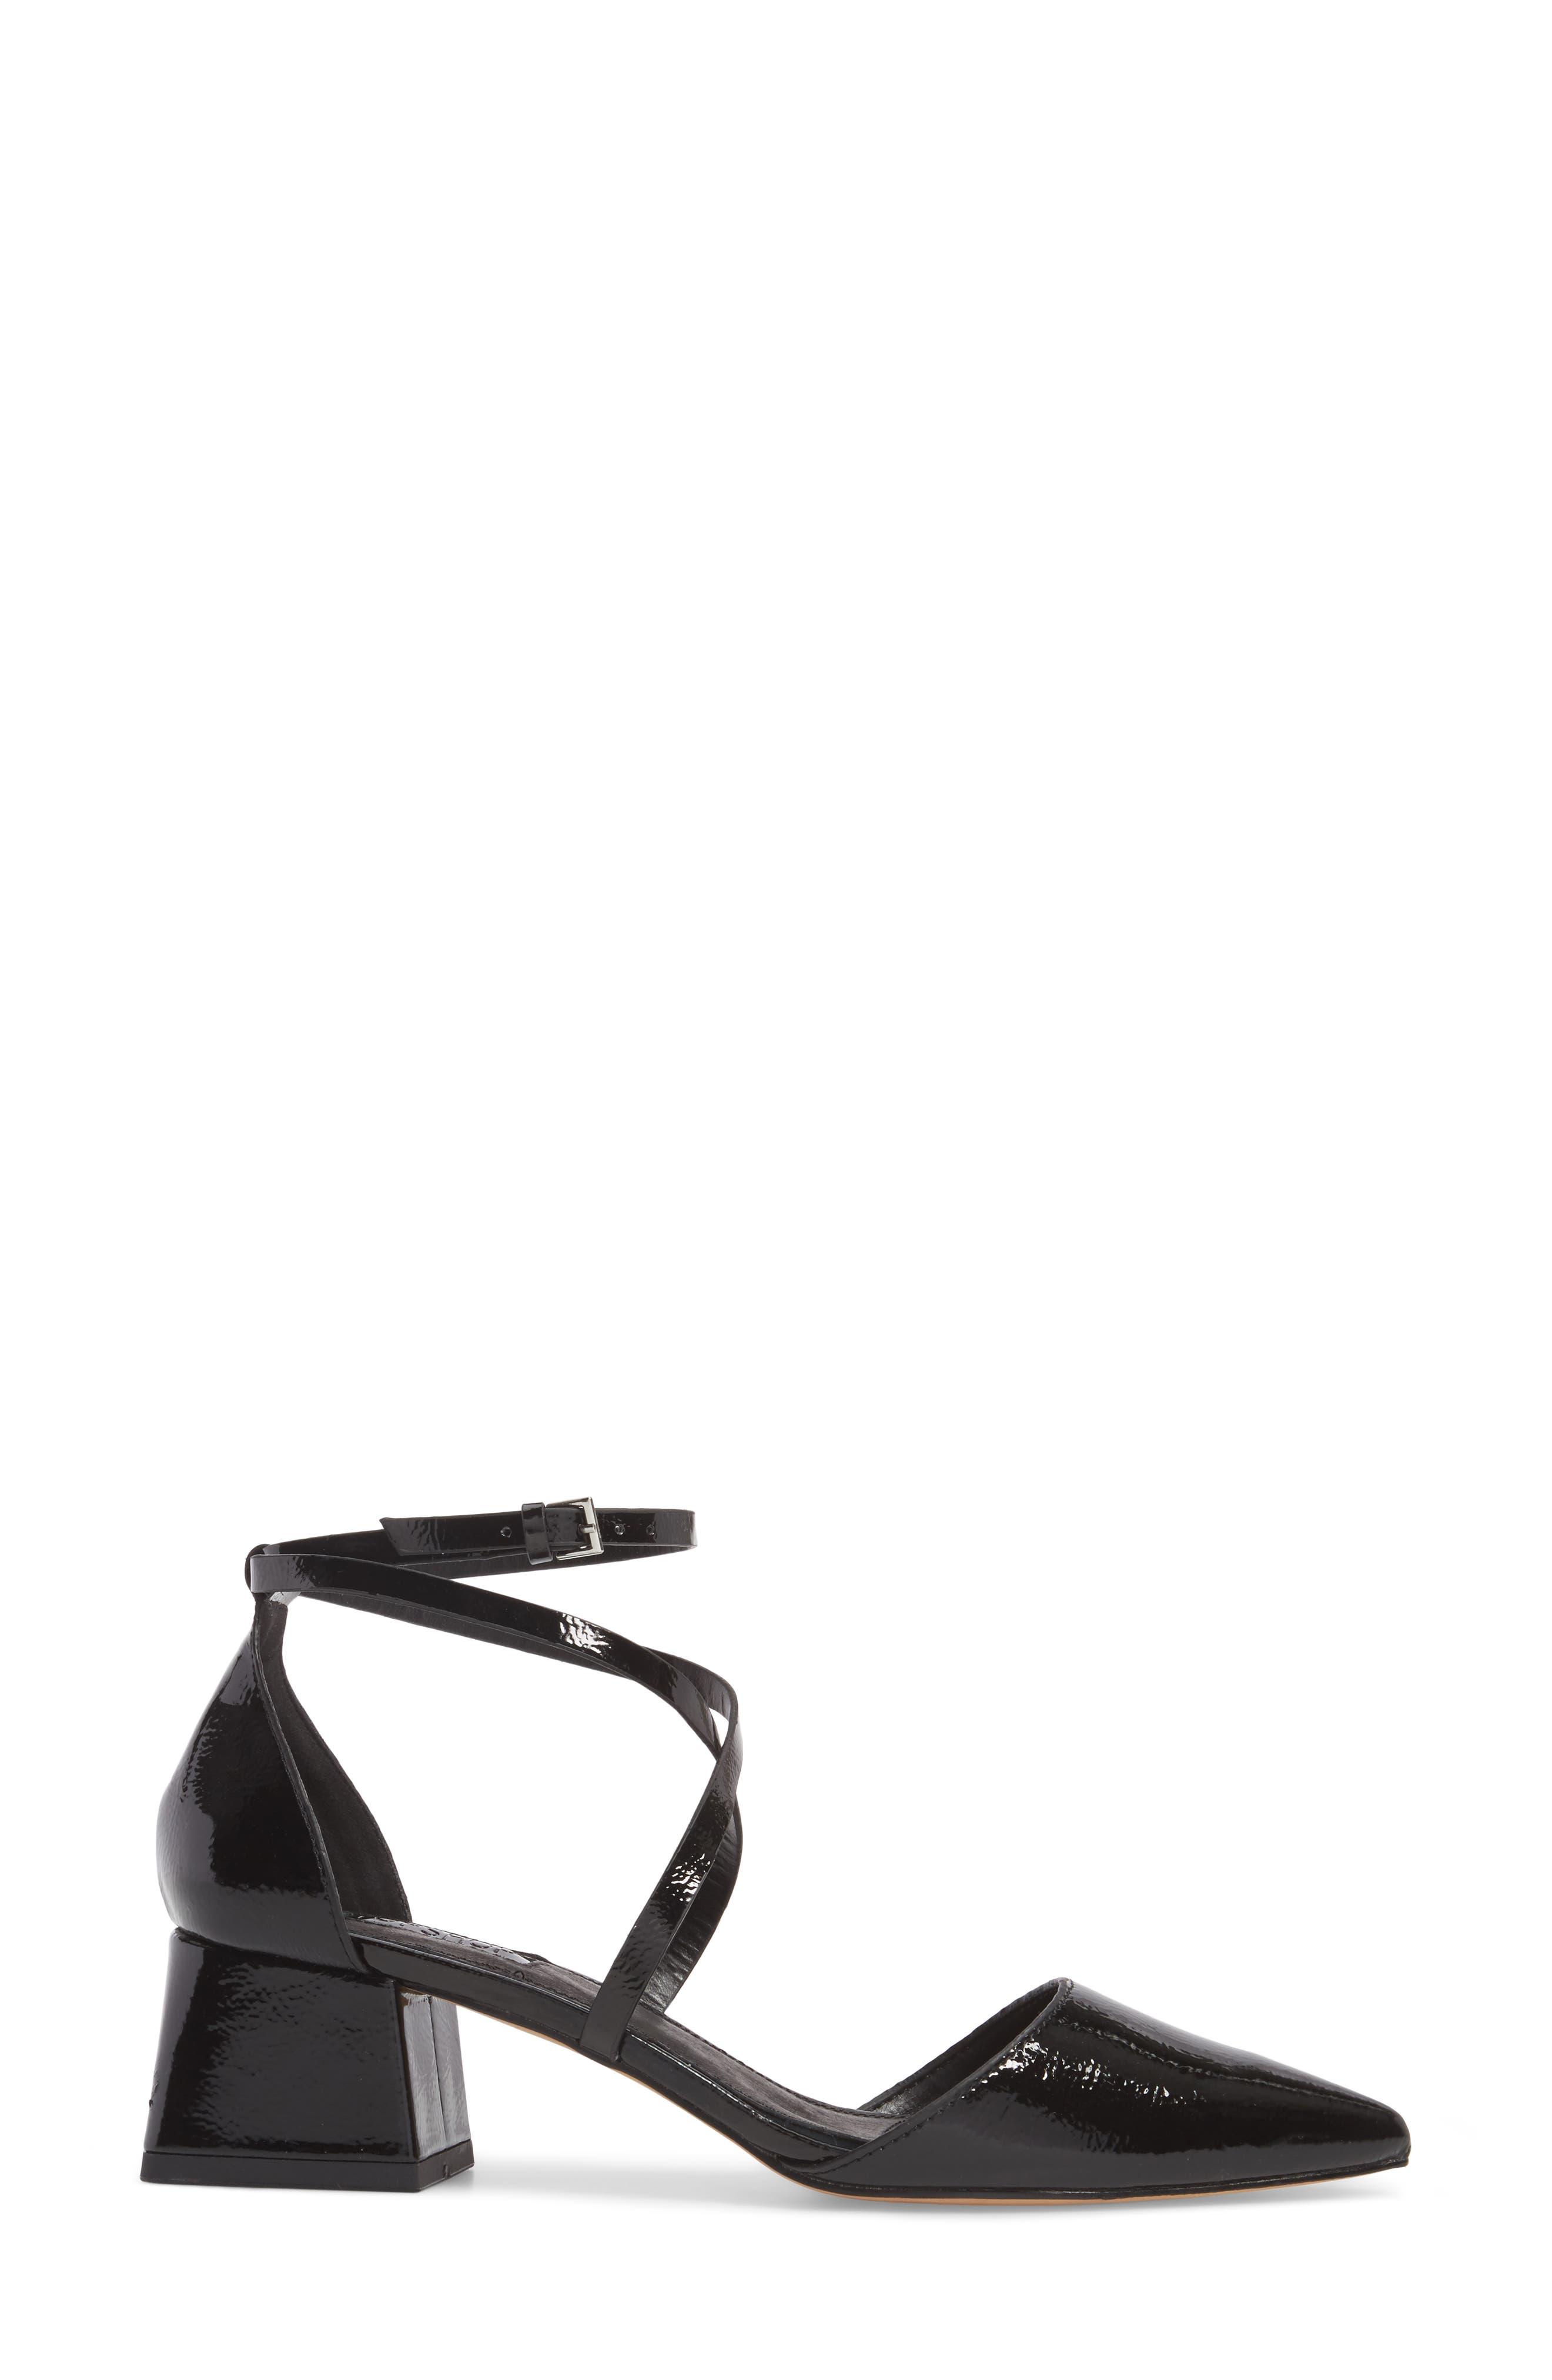 Alternate Image 3  - Topshop Jolly Flared Heel d'Orsay Pump (Women)